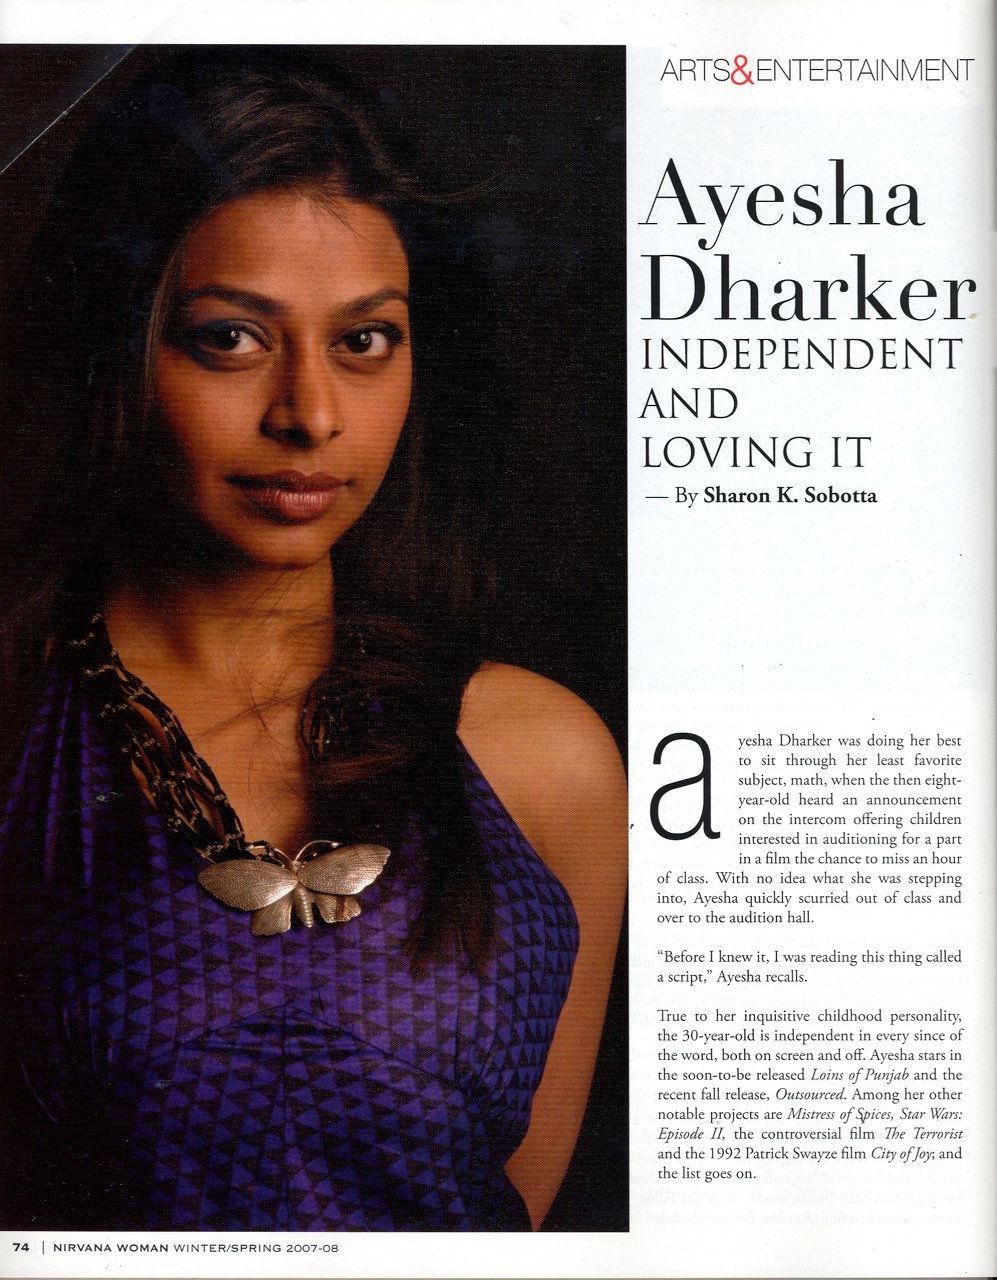 ayesha dharker robert taylorayesha dharker star wars, ayesha dharker wiki, ayesha dharker married robert taylor, ayesha dharker wedding, ayesha dharker robert taylor, ayesha dharker doctor who, ayesha dharker twitter, ayesha dharker imdb, ayesha dharker othello, ayesha dharker wallpapers